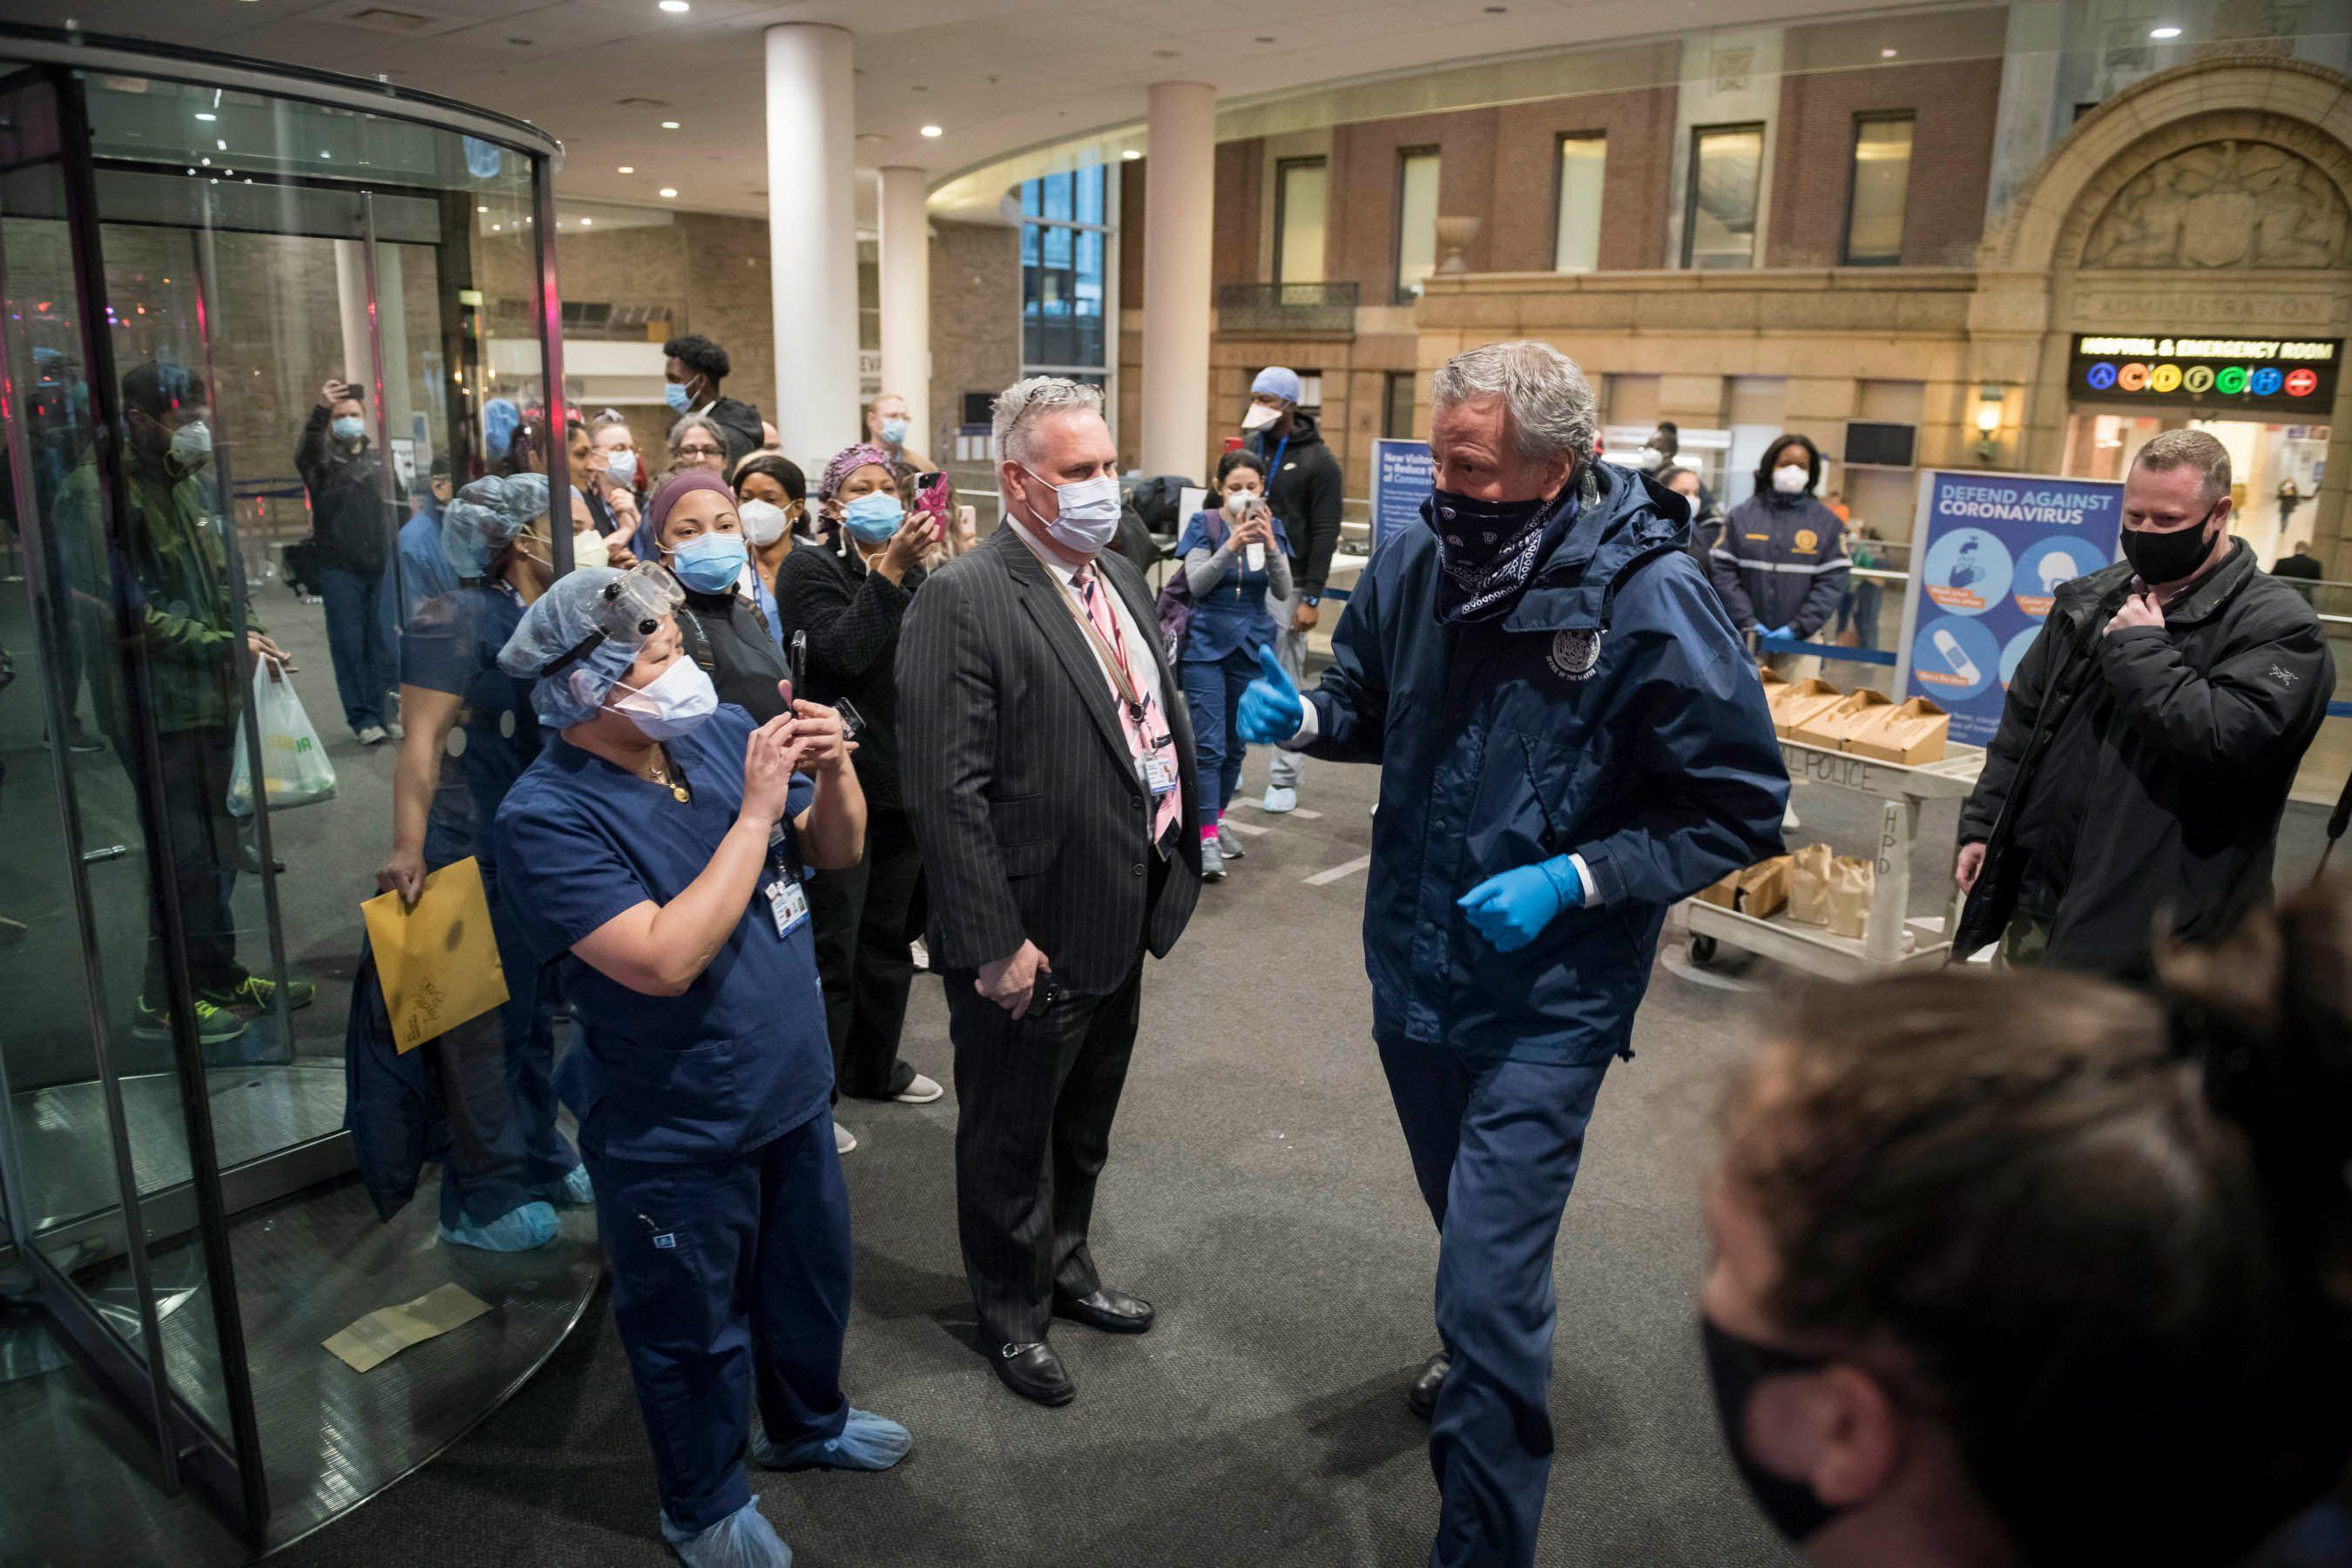 Mayor Bill de Blasio visits Bellevue Hospital workers during the coronavirus outbreak, April 10, 2020.